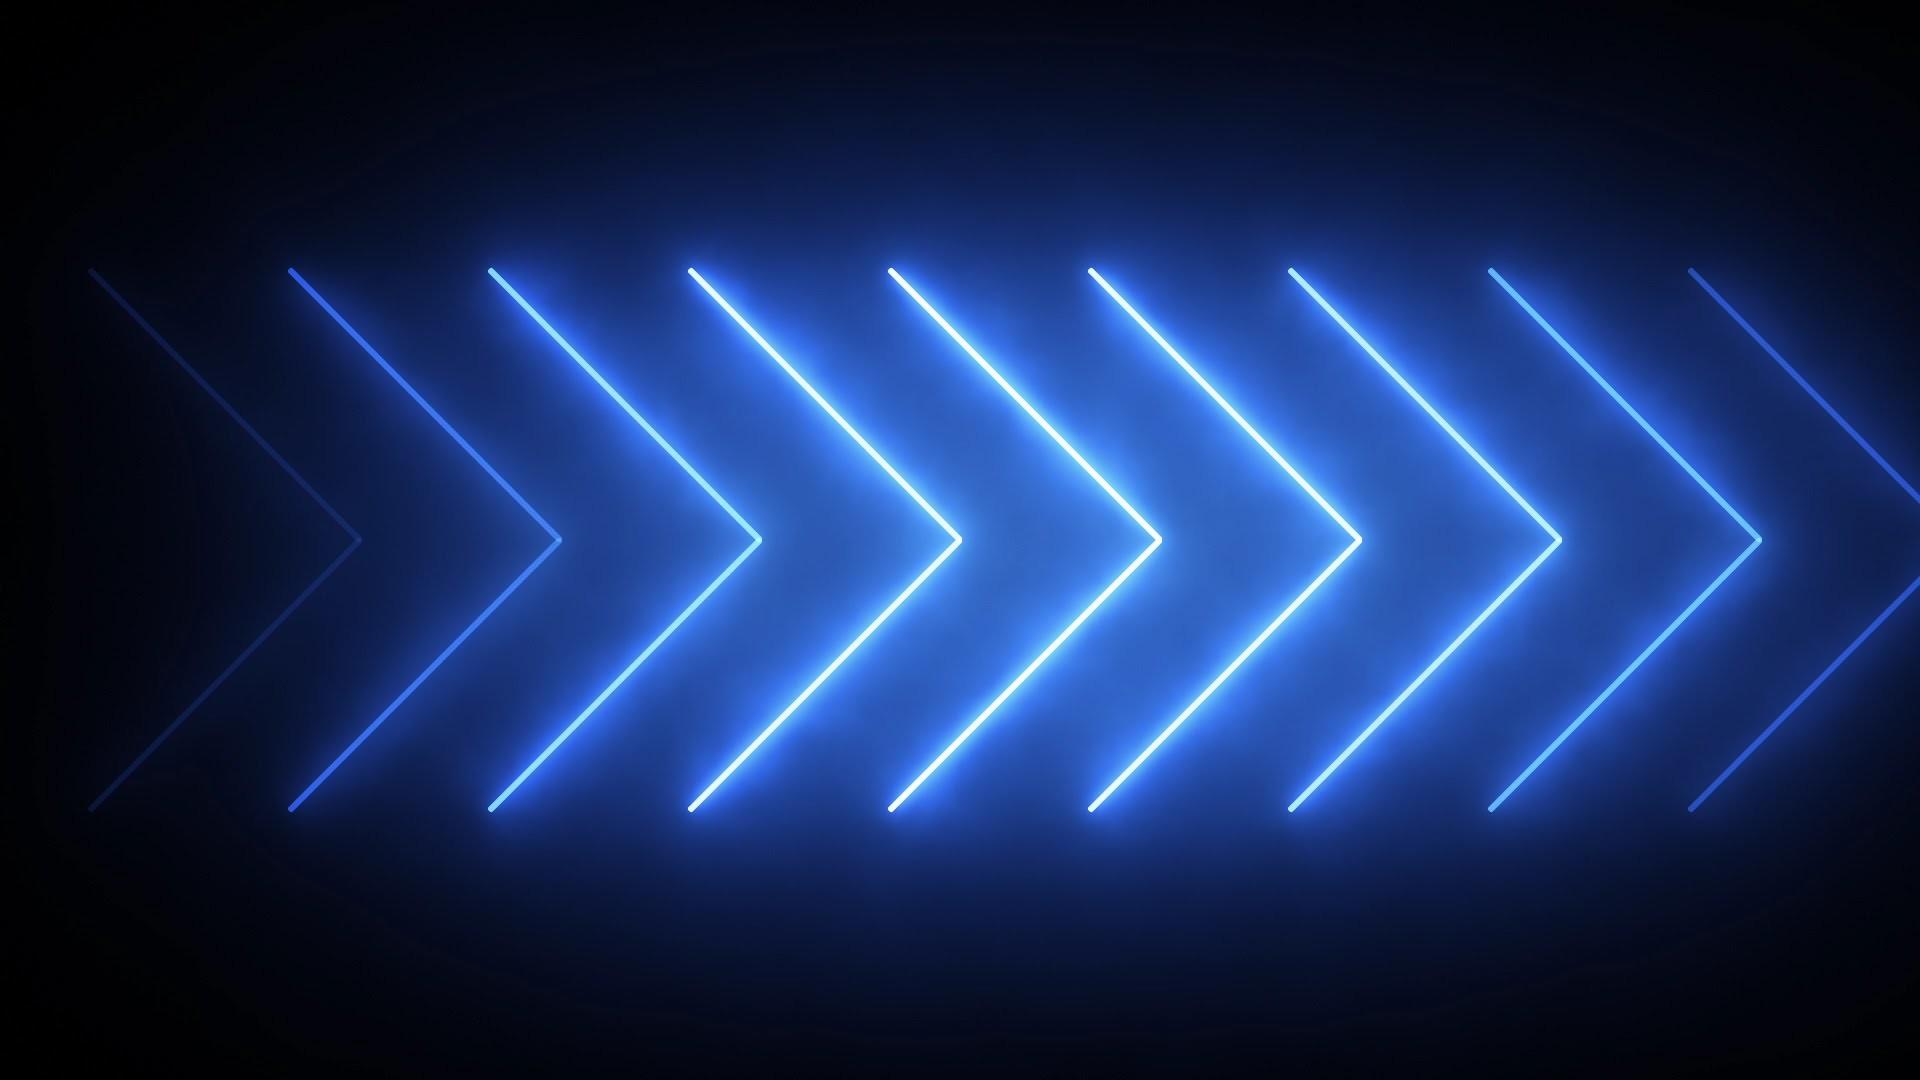 Blue Neon Background Wallpapertag